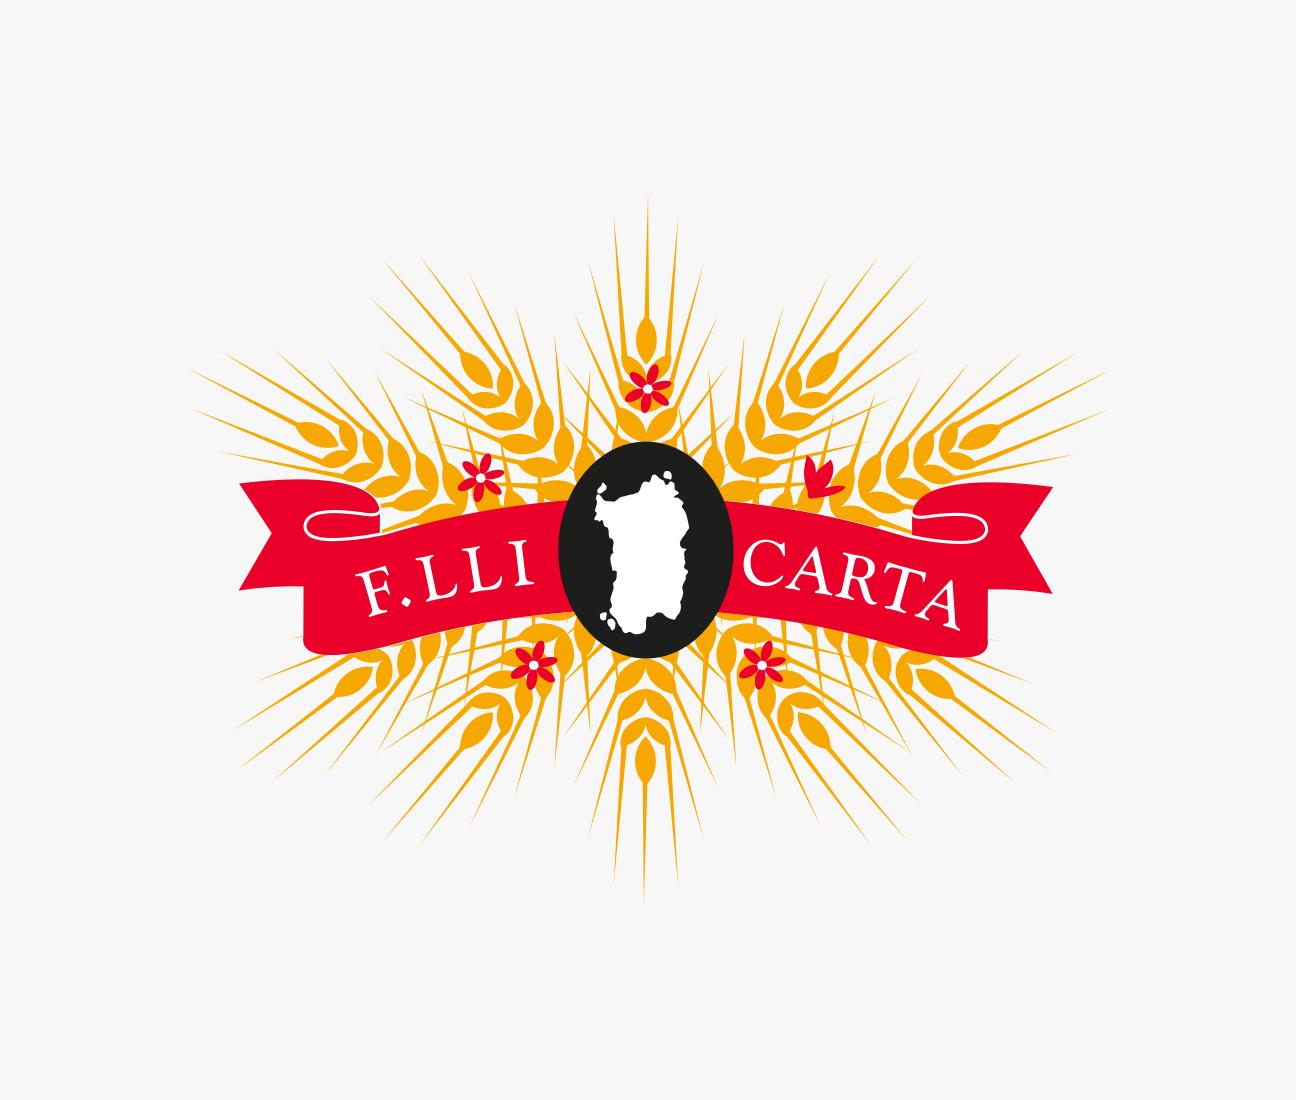 Fratelli Carta